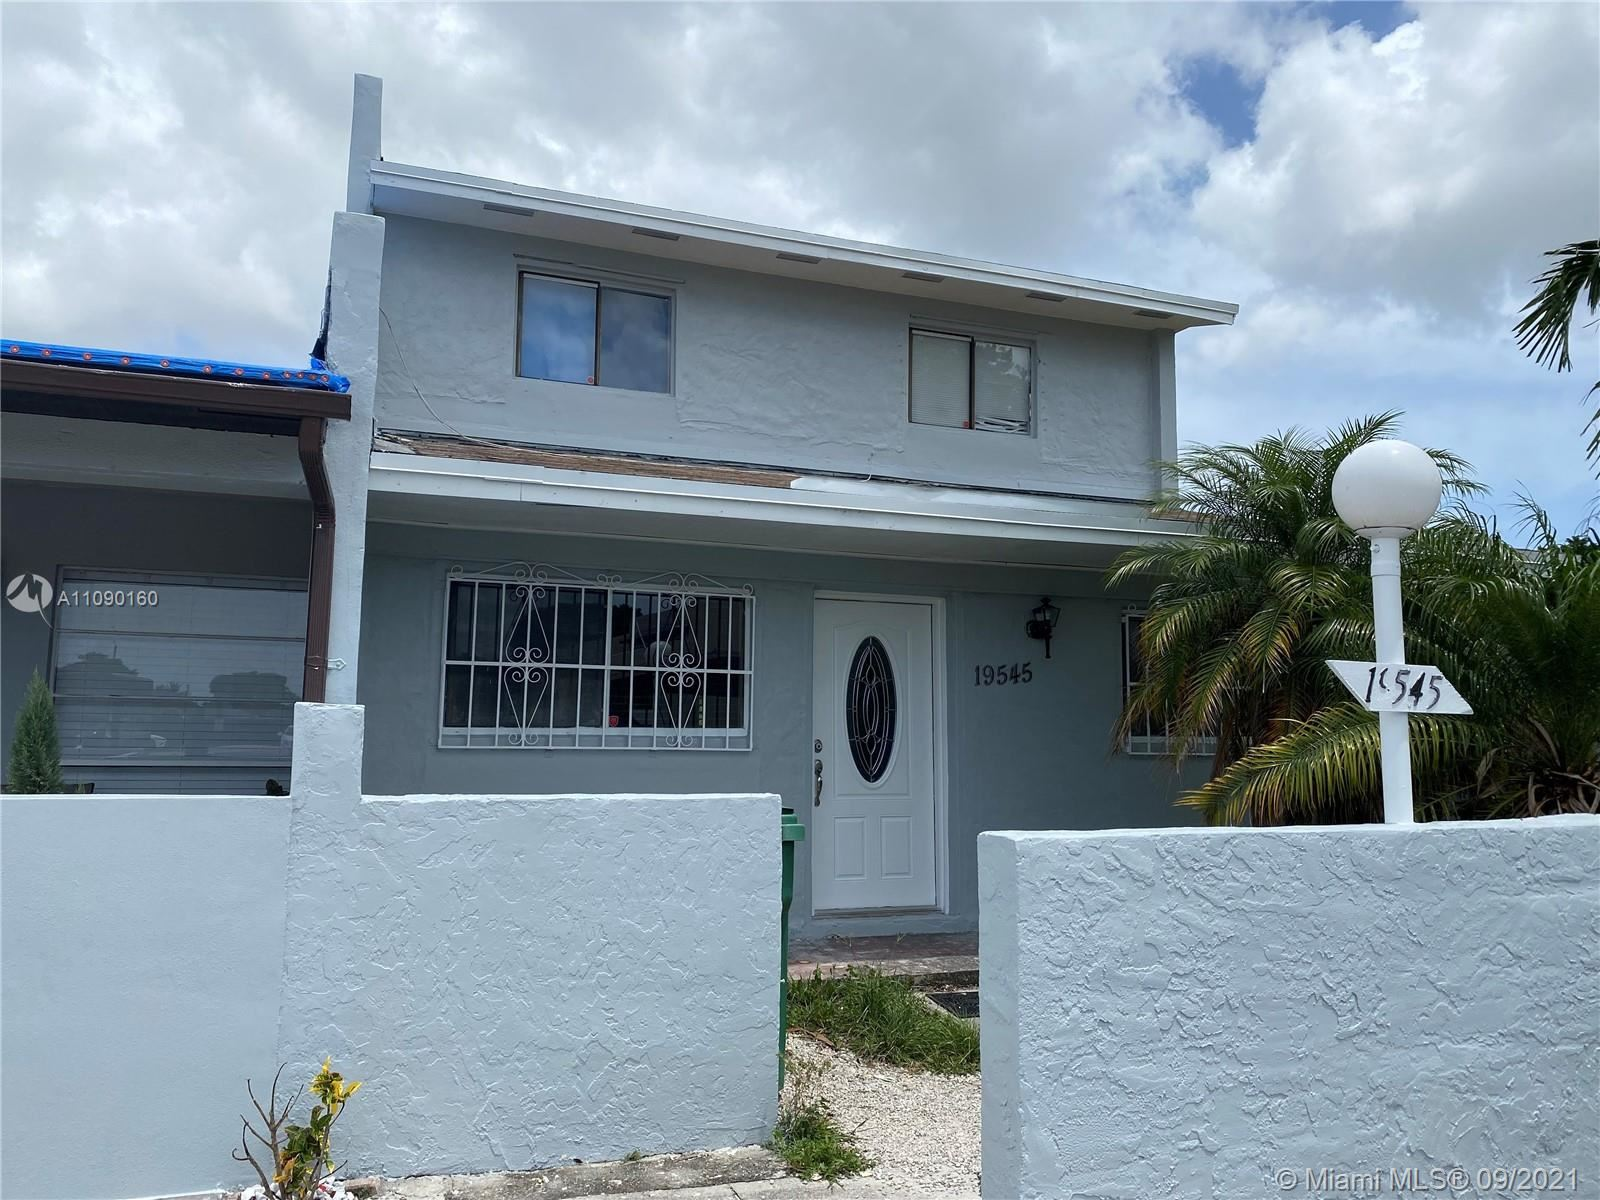 19545 NW 55th Circle Pl, Miami Gardens, FL 33055 - #: A11090160